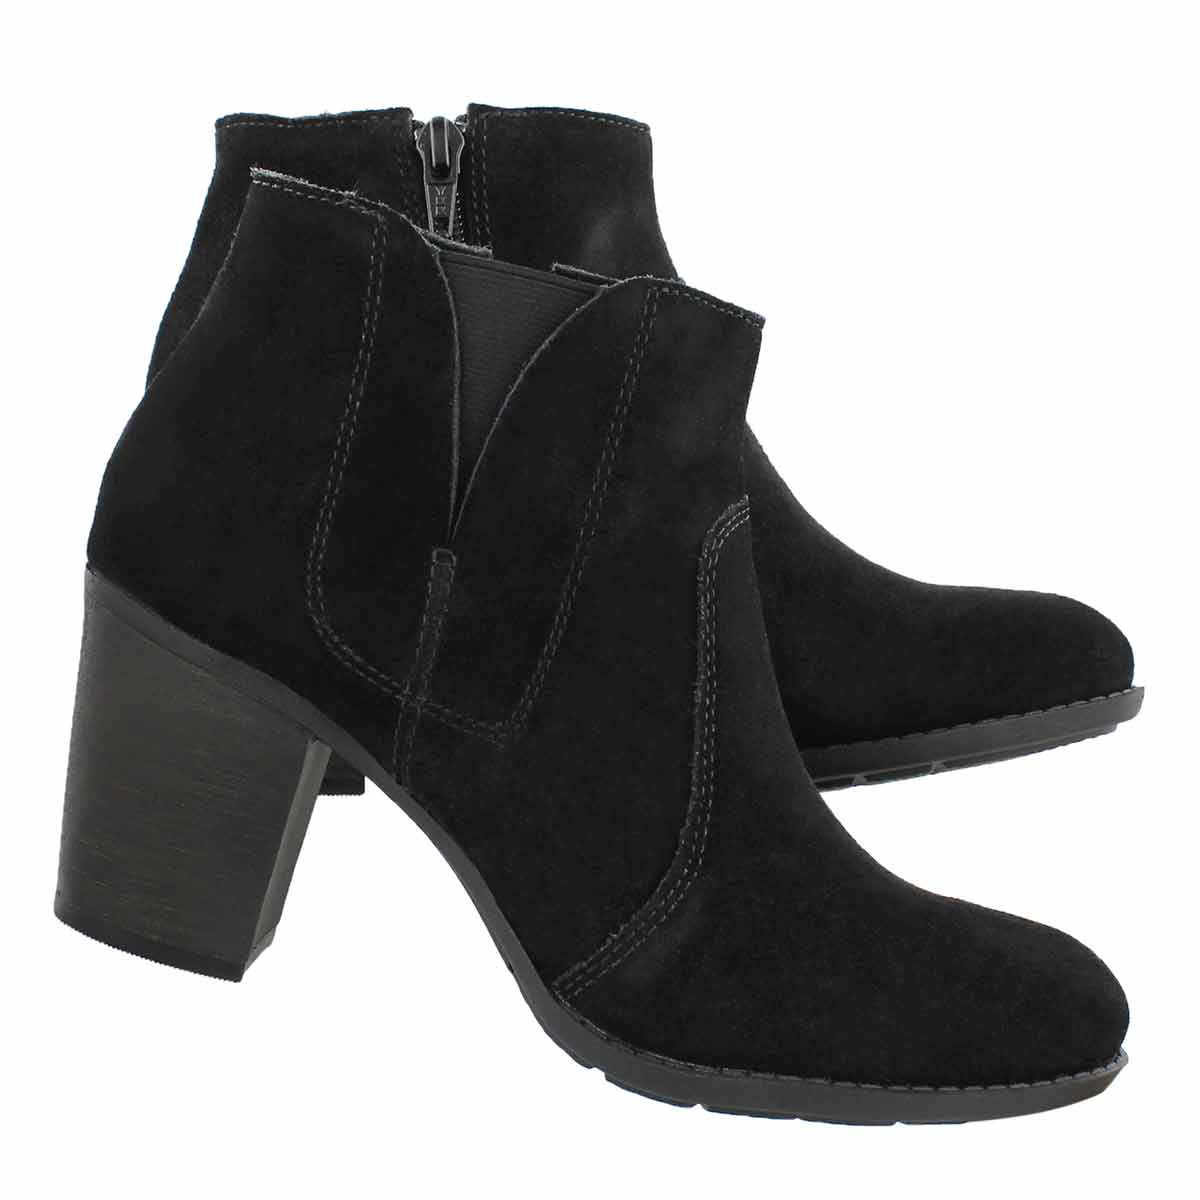 Lds Enfield Senya black dress bootie